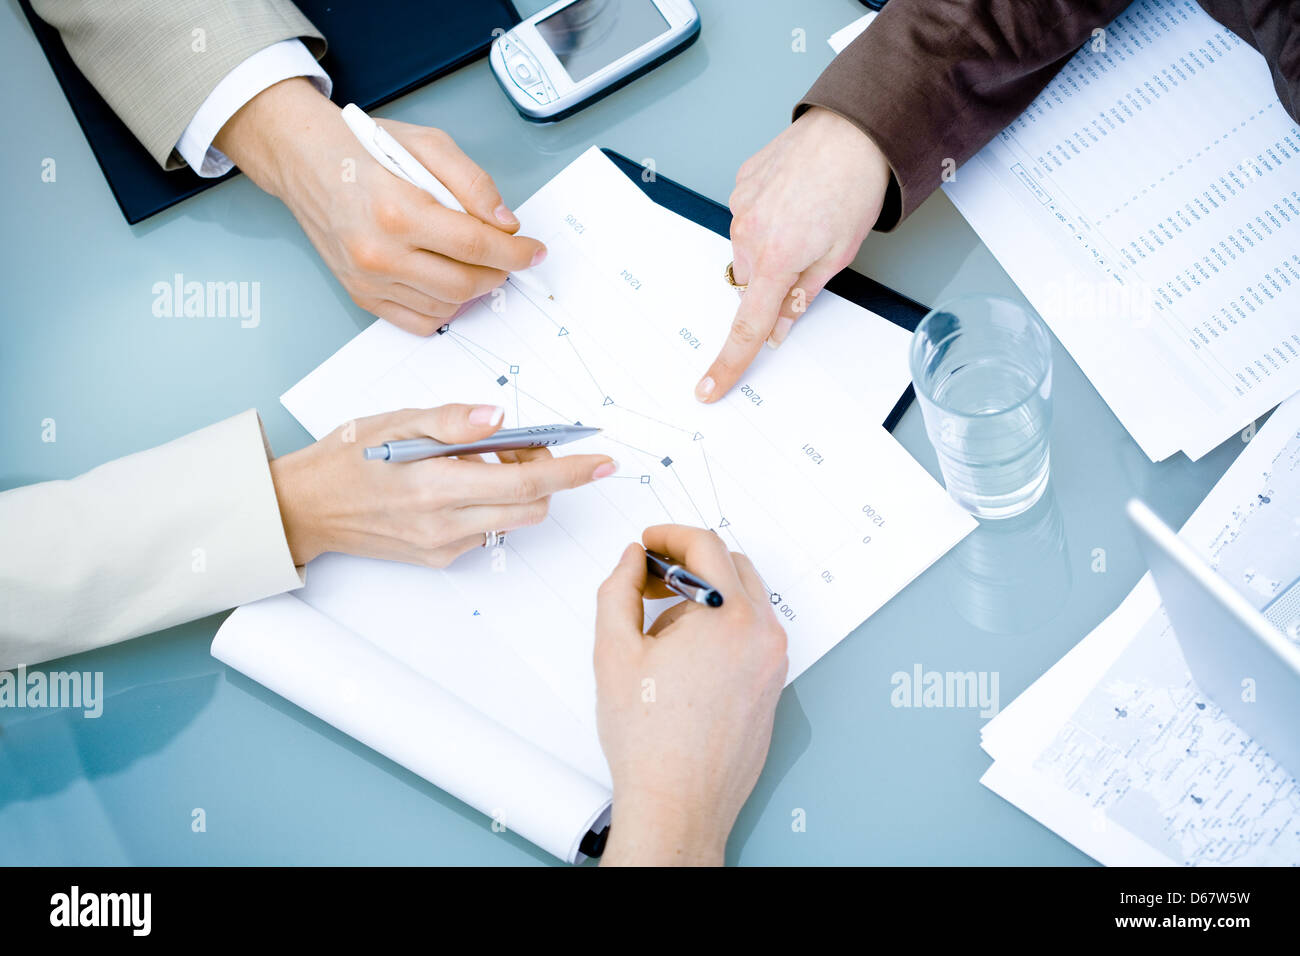 office,workplace,teamwork,meeting,conversation - Stock Image